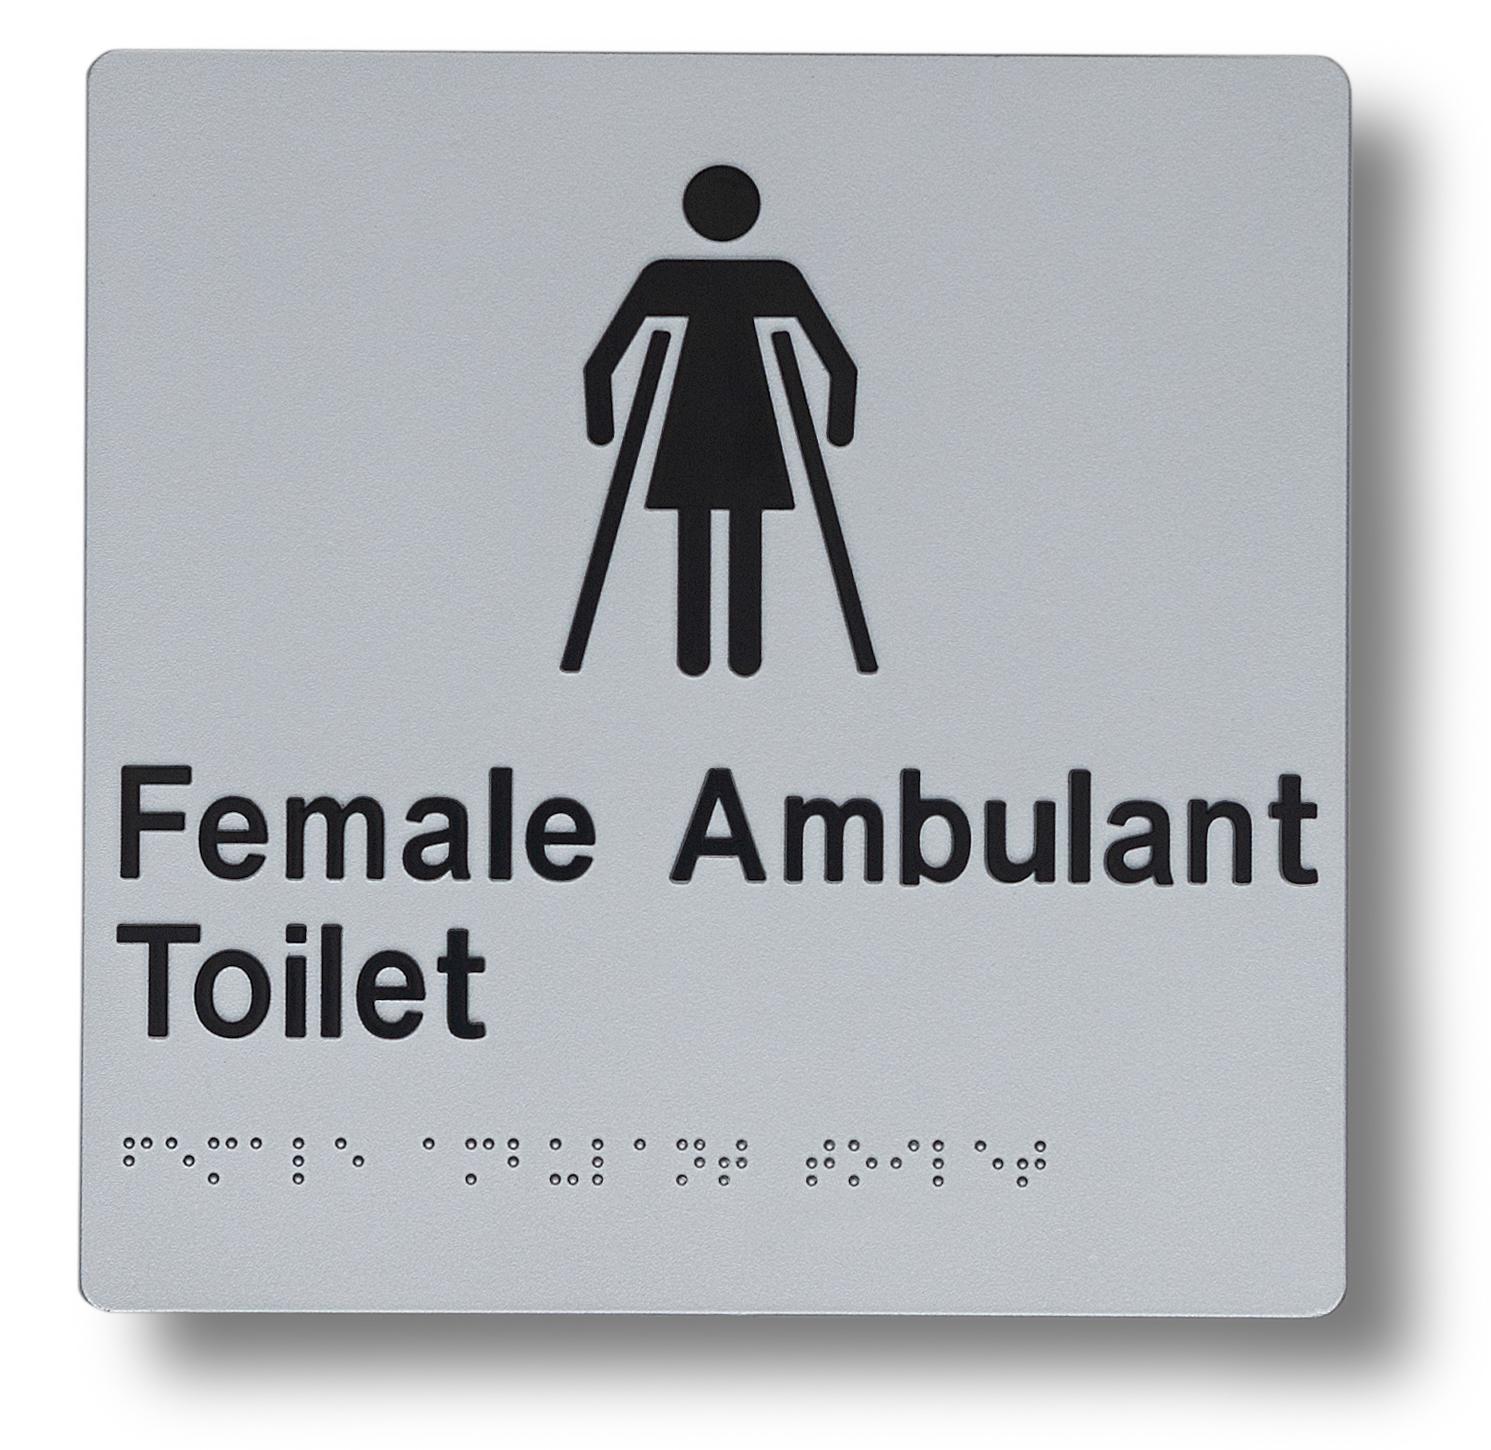 Braille sign - Female Ambulant Toilet